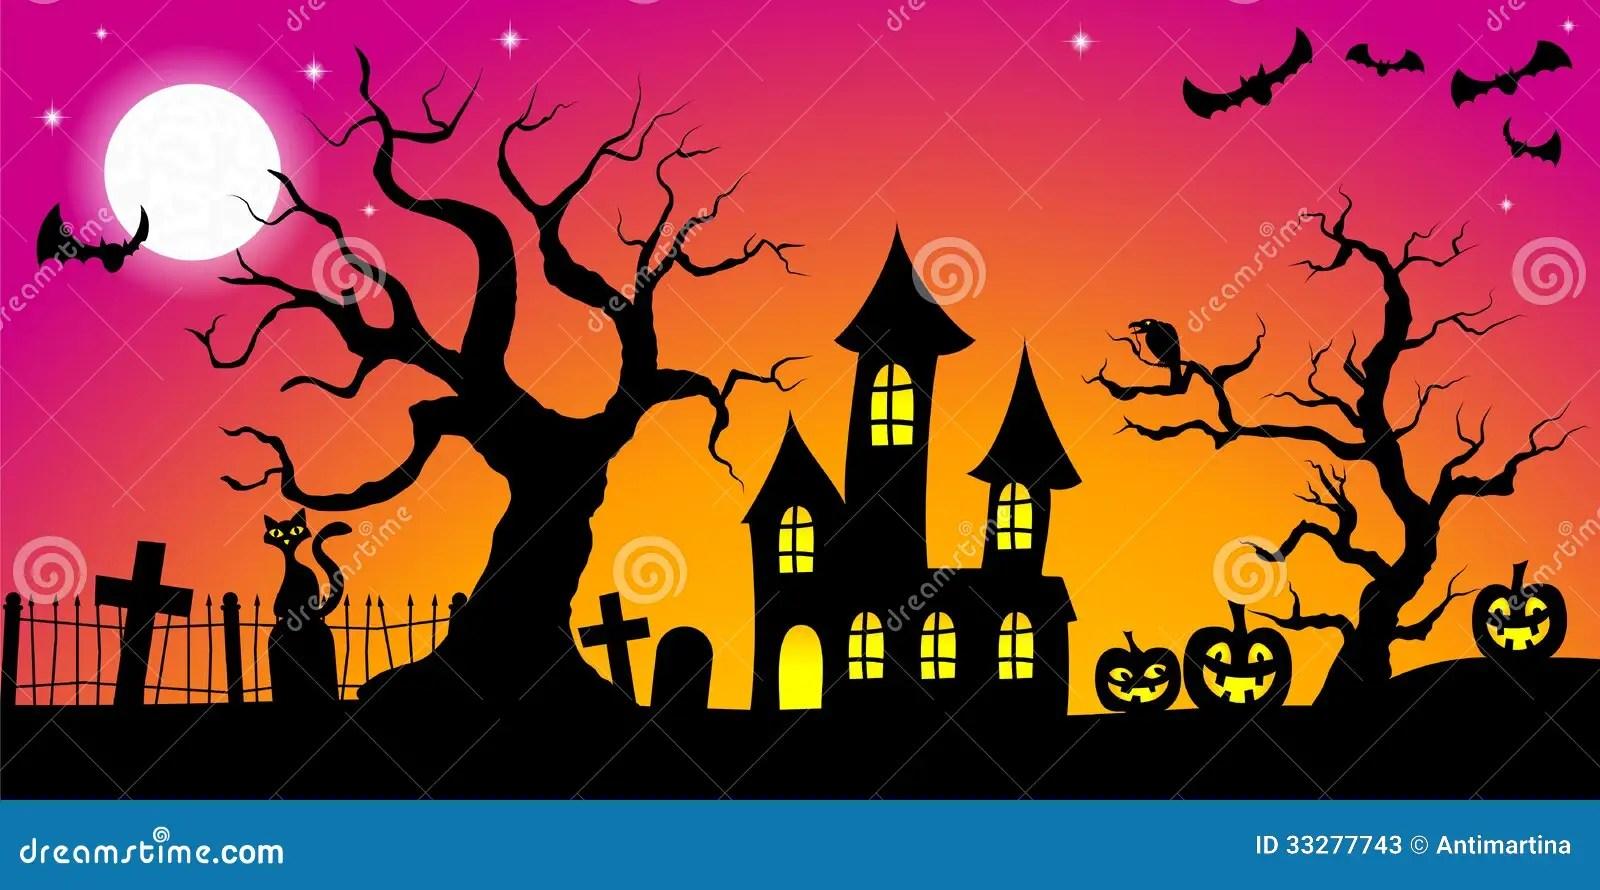 Fall Graveyard Cemetery Wallpaper Spooky Halloween Background Stock Photos Image 33277743